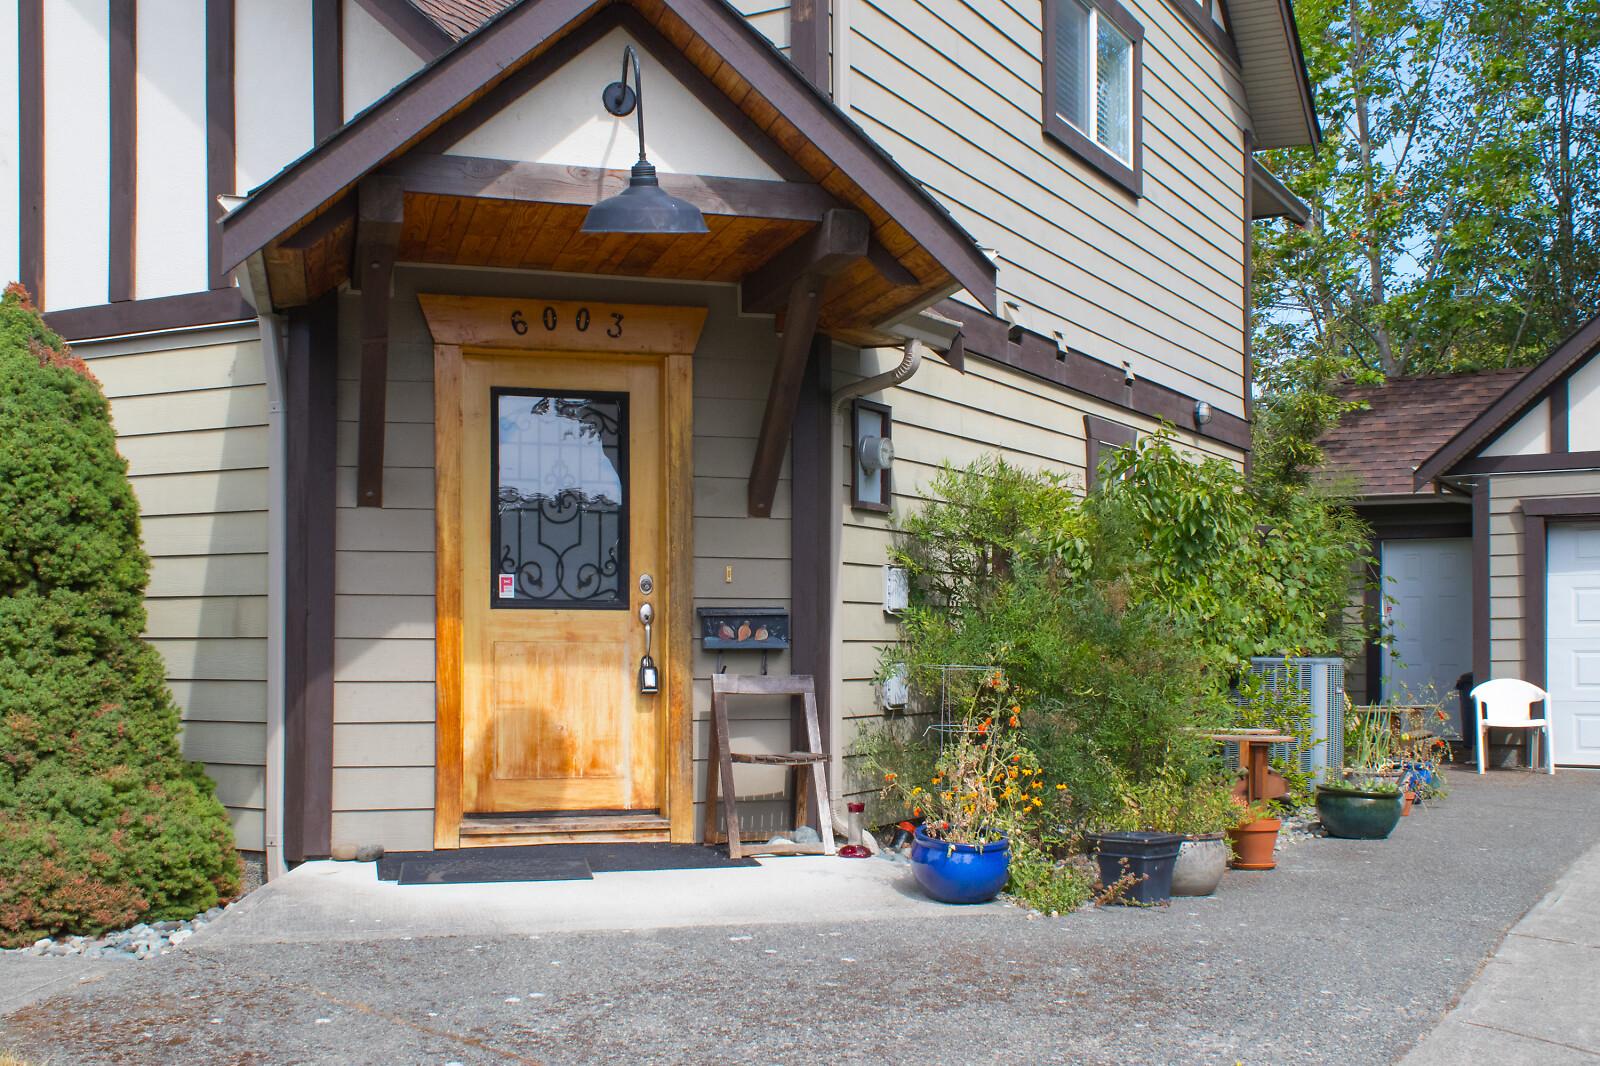 6003 Stonehaven Drive, Duncan, British Columbia  V9L 0A1 - Photo 5 - 885028